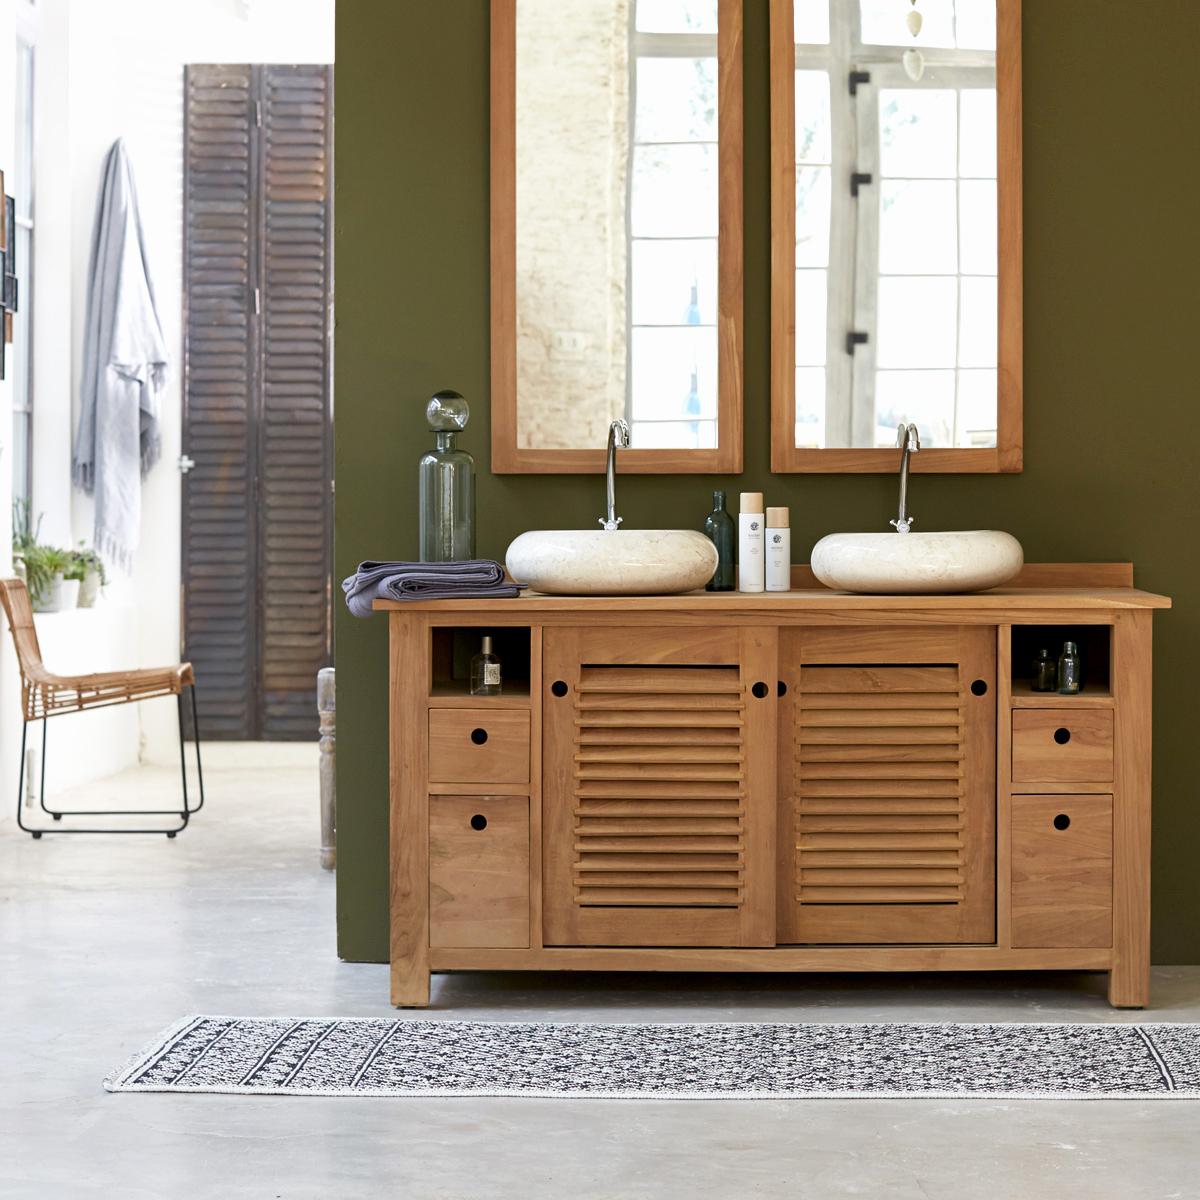 Vasque Salle De Bain Ikea Luxe Images Double Vasque Ikea Nouveau M–llekulla Countertop Oak Conception De